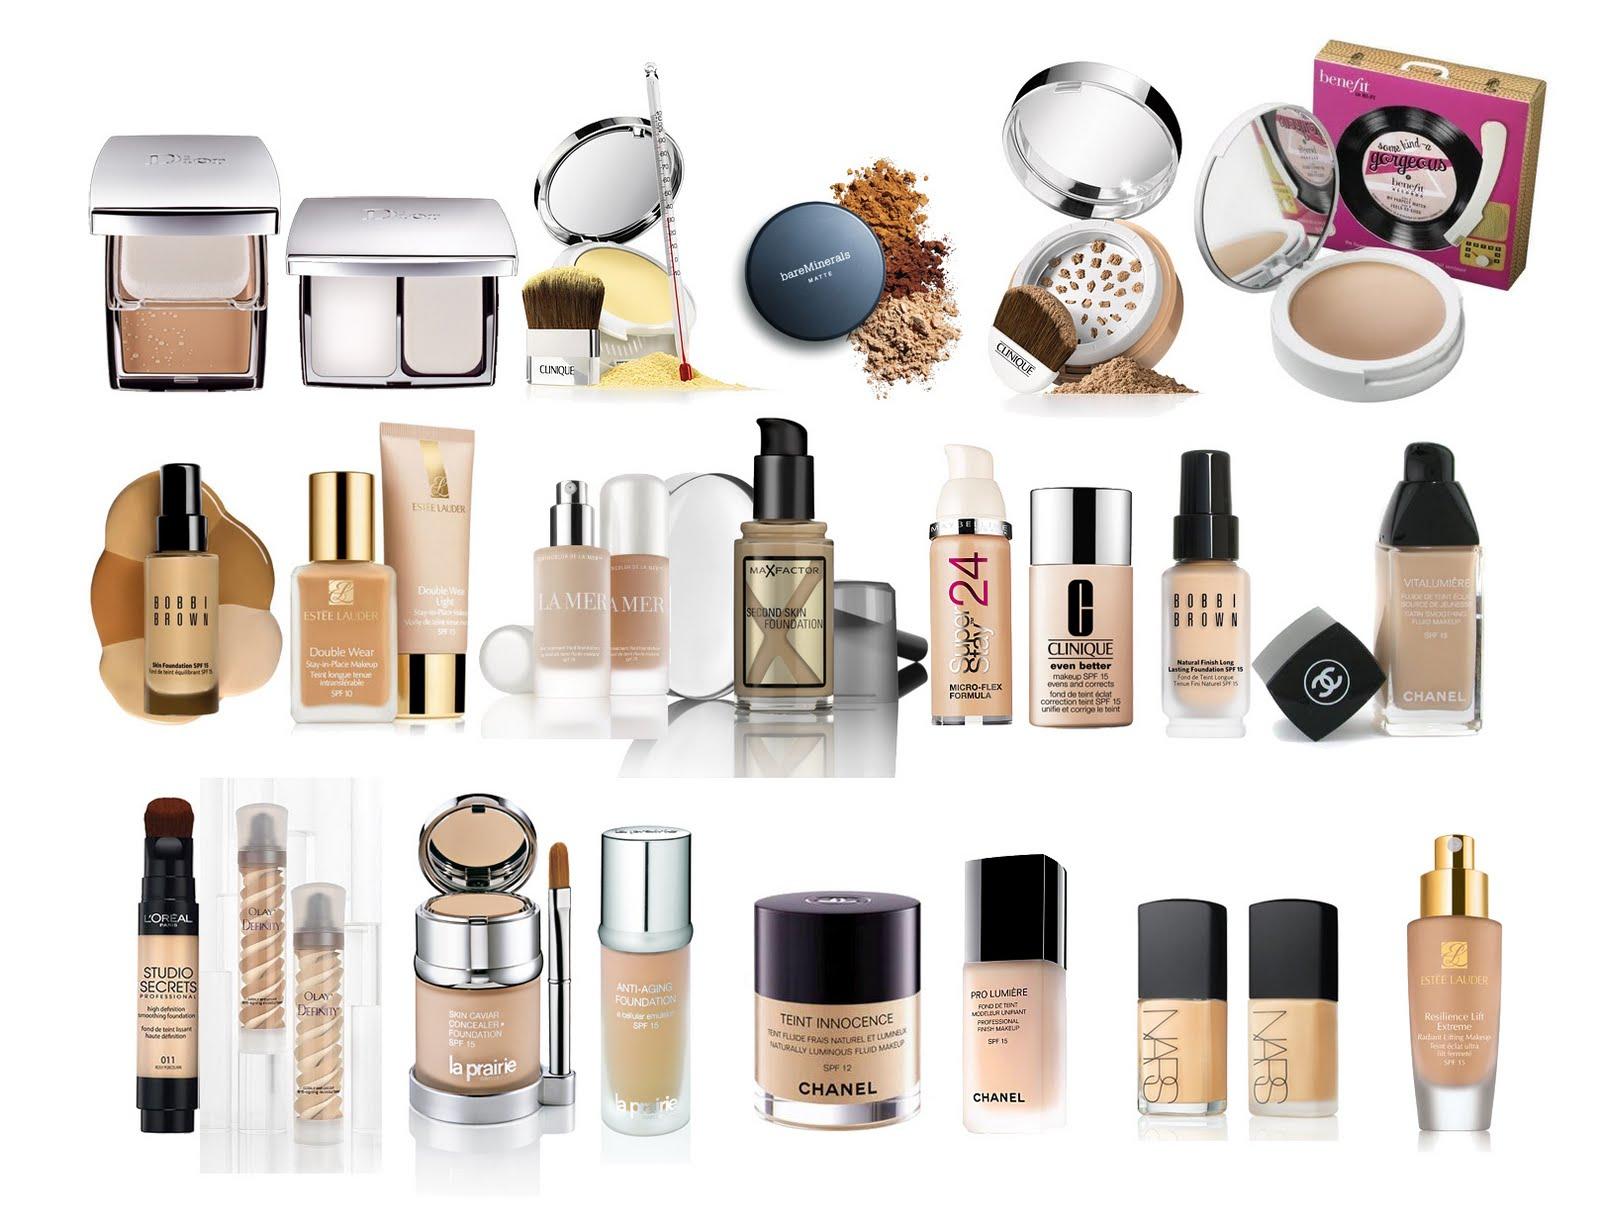 belleza nubia costa rica top 5 bases de maquillaje para piel grasa. Black Bedroom Furniture Sets. Home Design Ideas